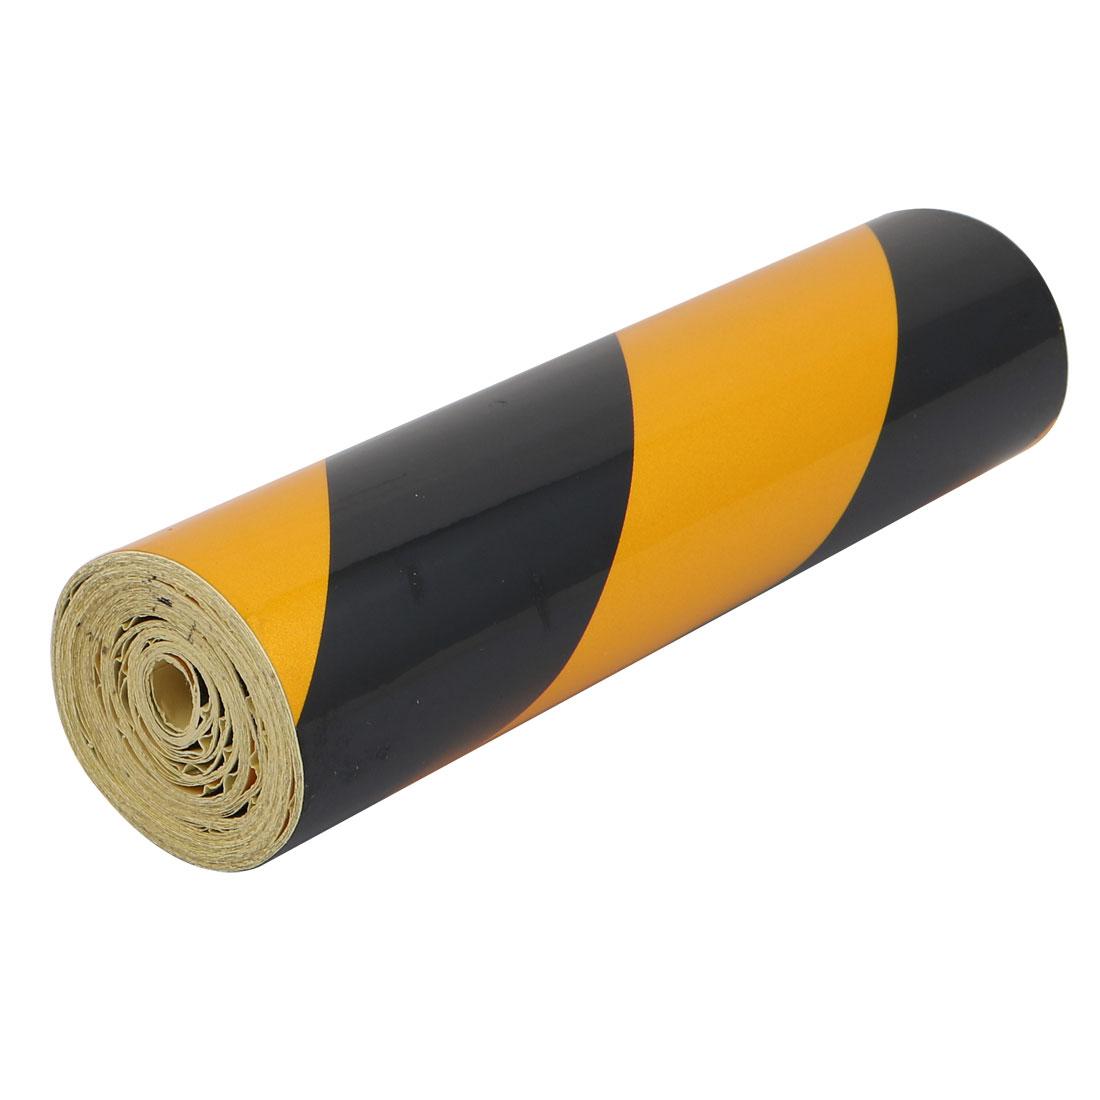 20cm Width 7M Length Single Sided Adhesive Reflective Warning Tape Yellow Black